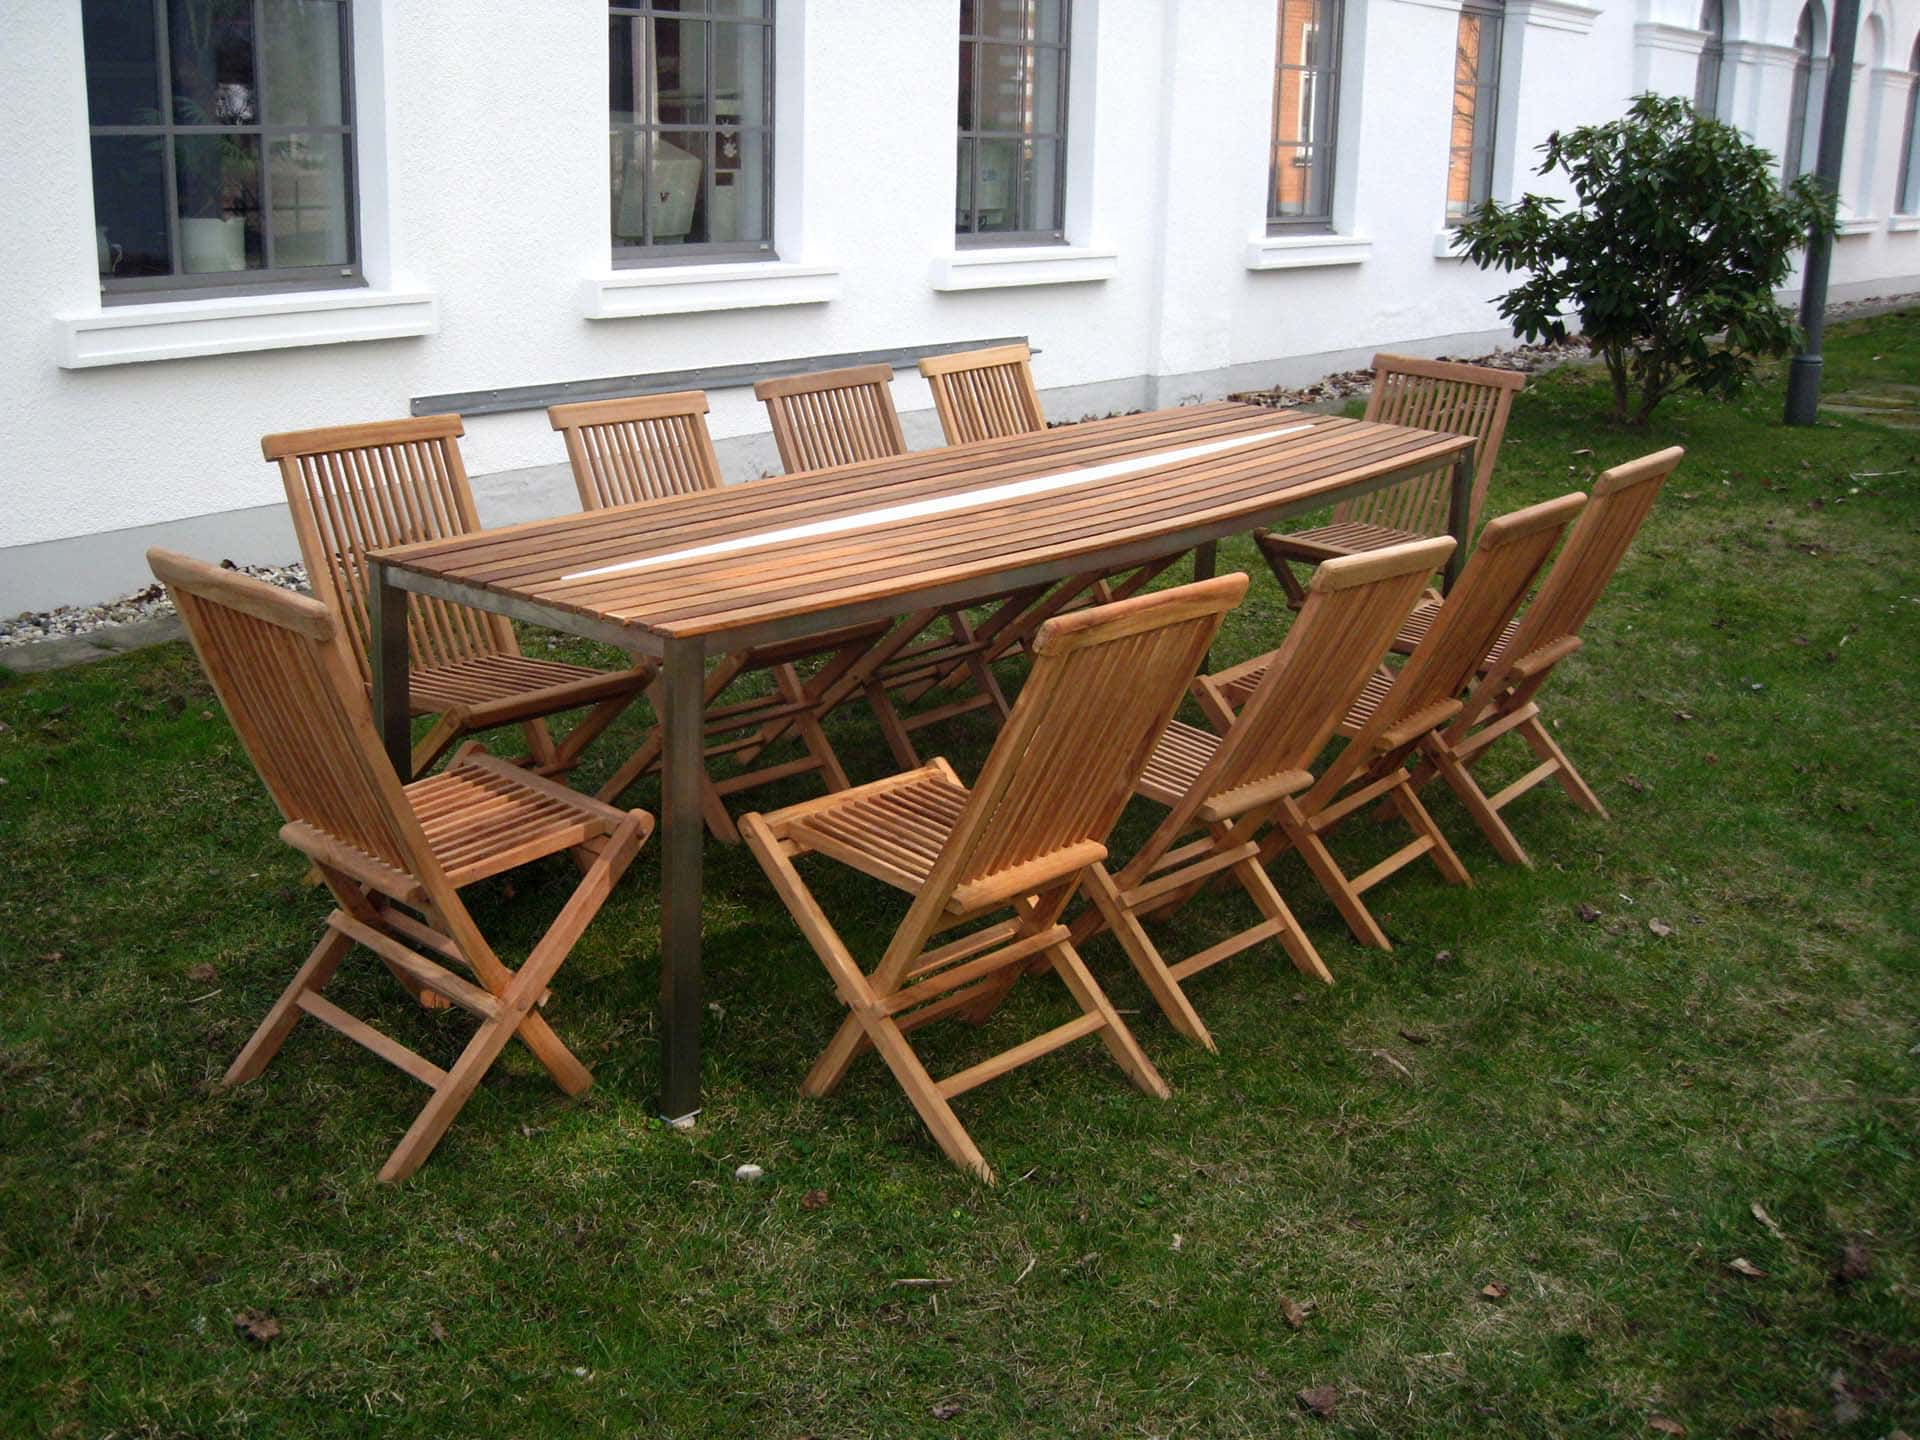 Design Tisch Sealine Nummer 3 aus Metall Holz by Sebastian Bohry timeless design